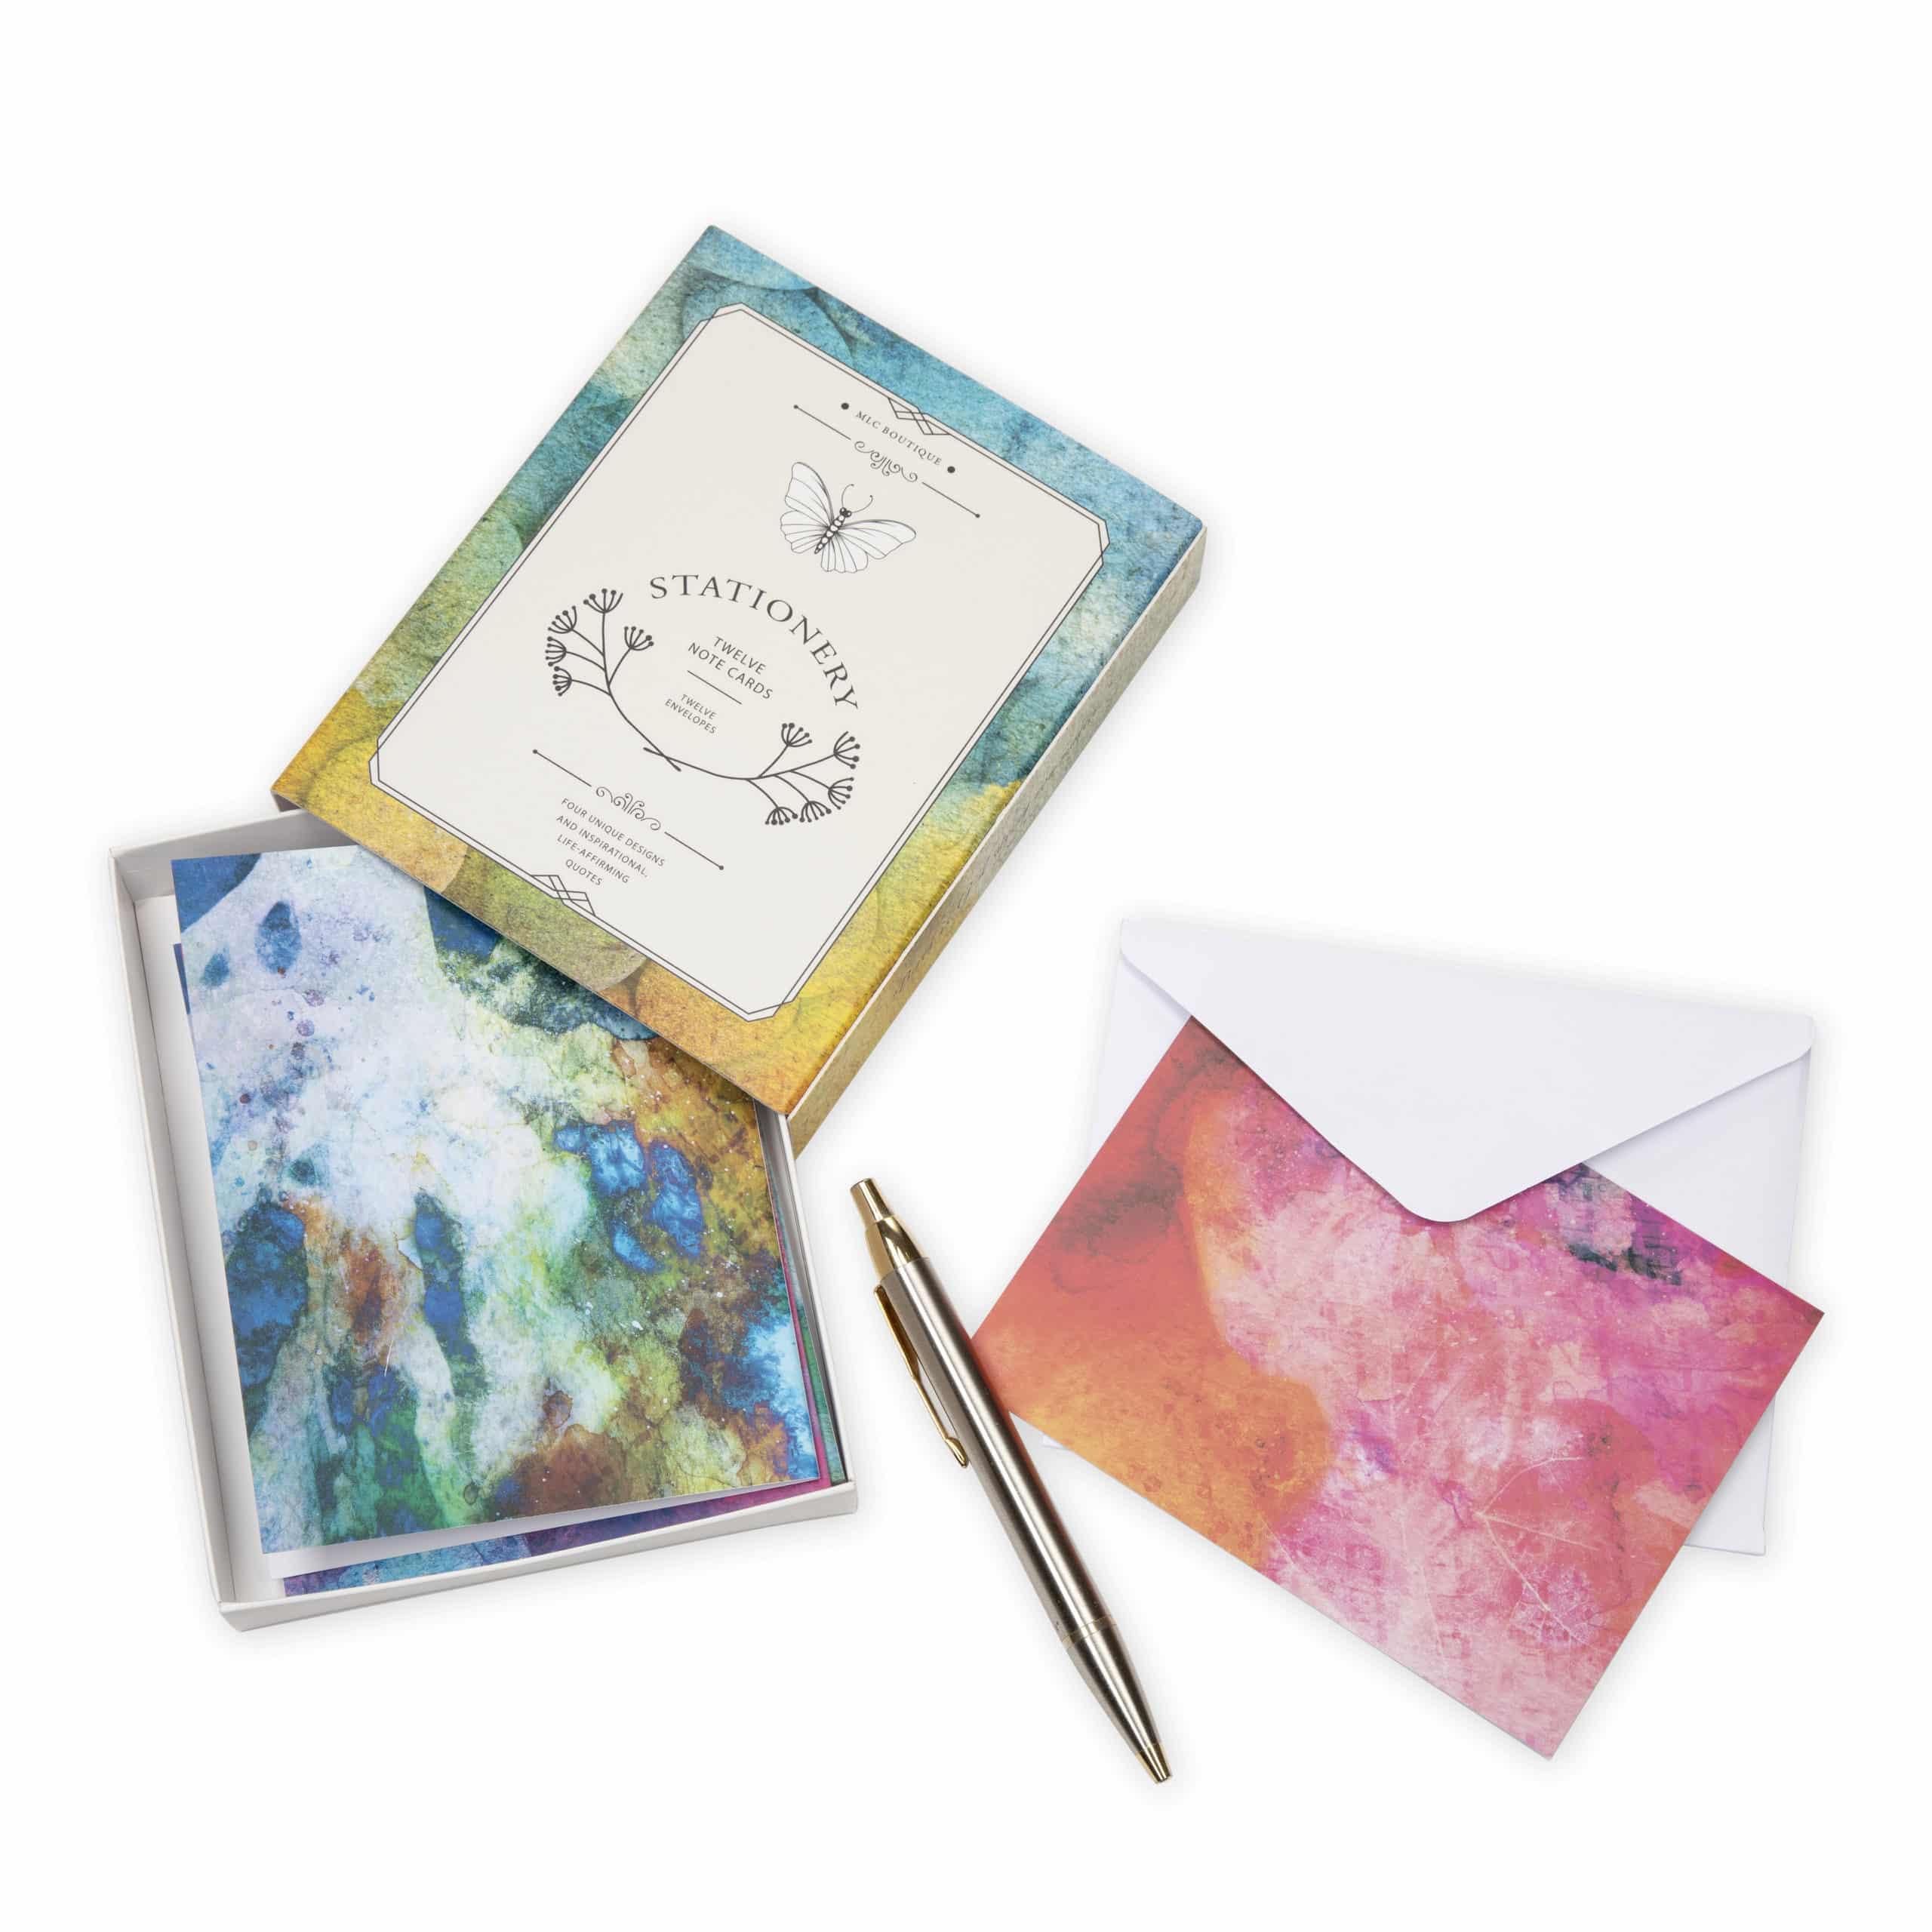 designer stationery gift set